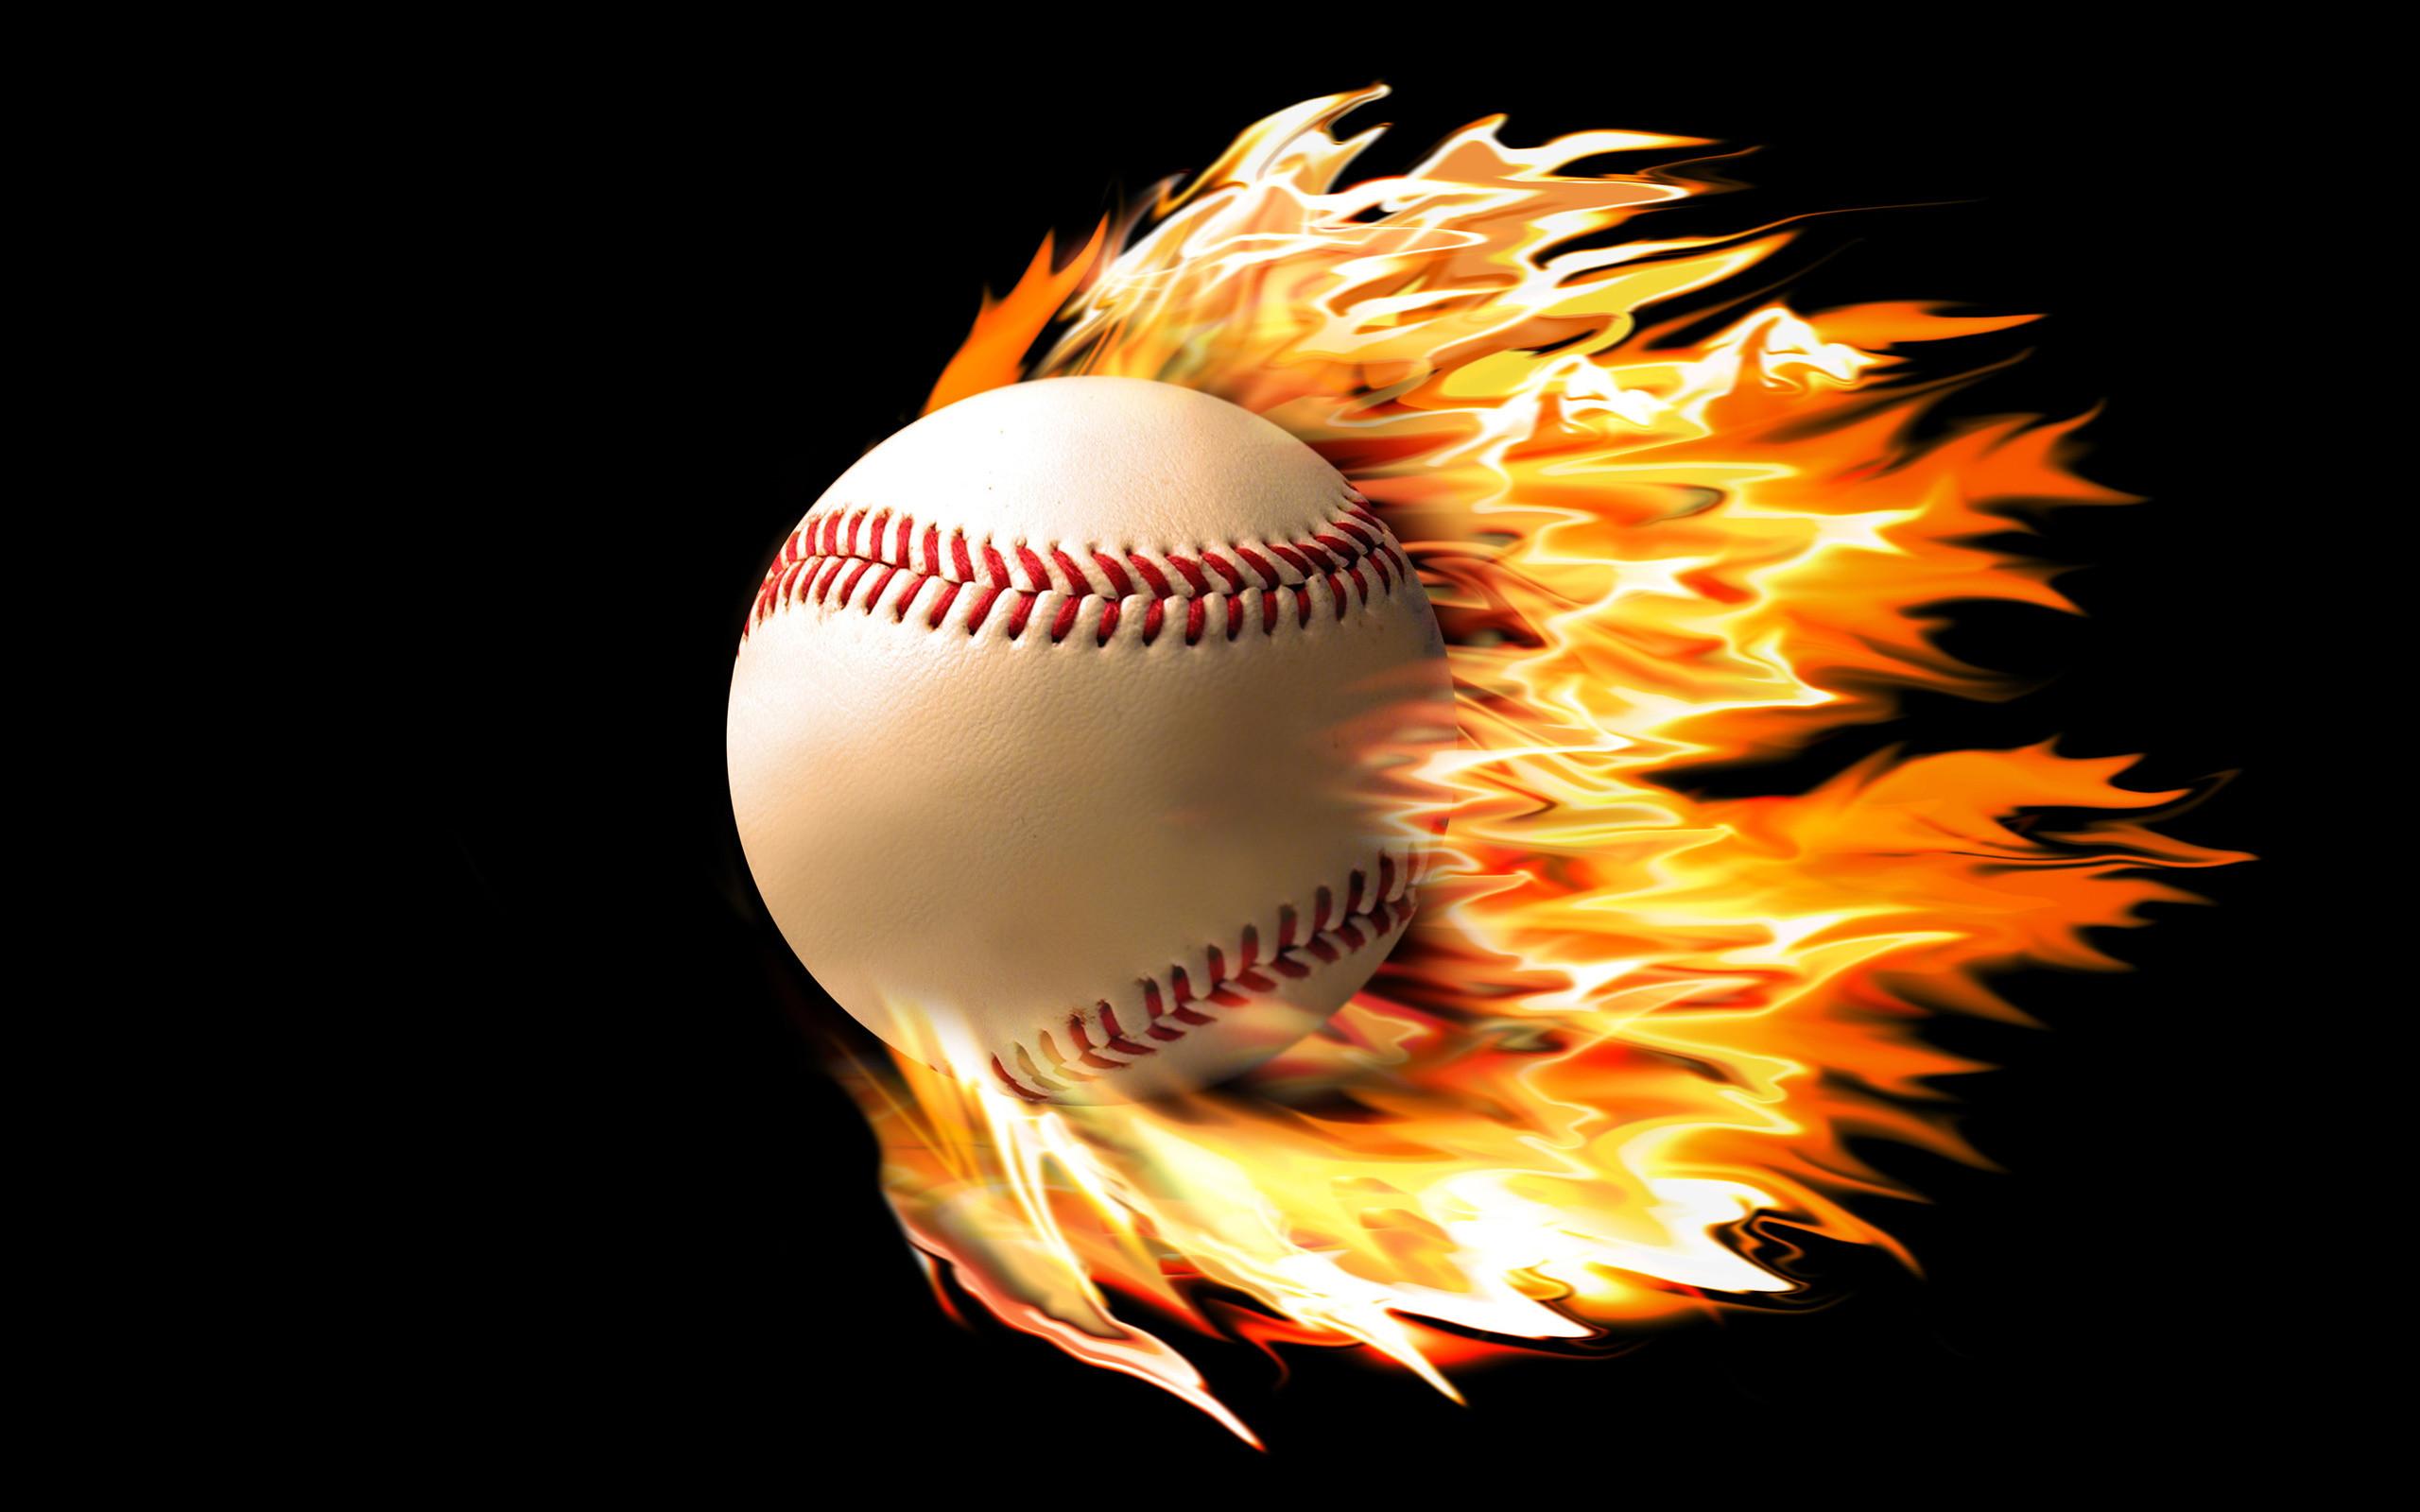 Baseball Wallpaper HD free download.